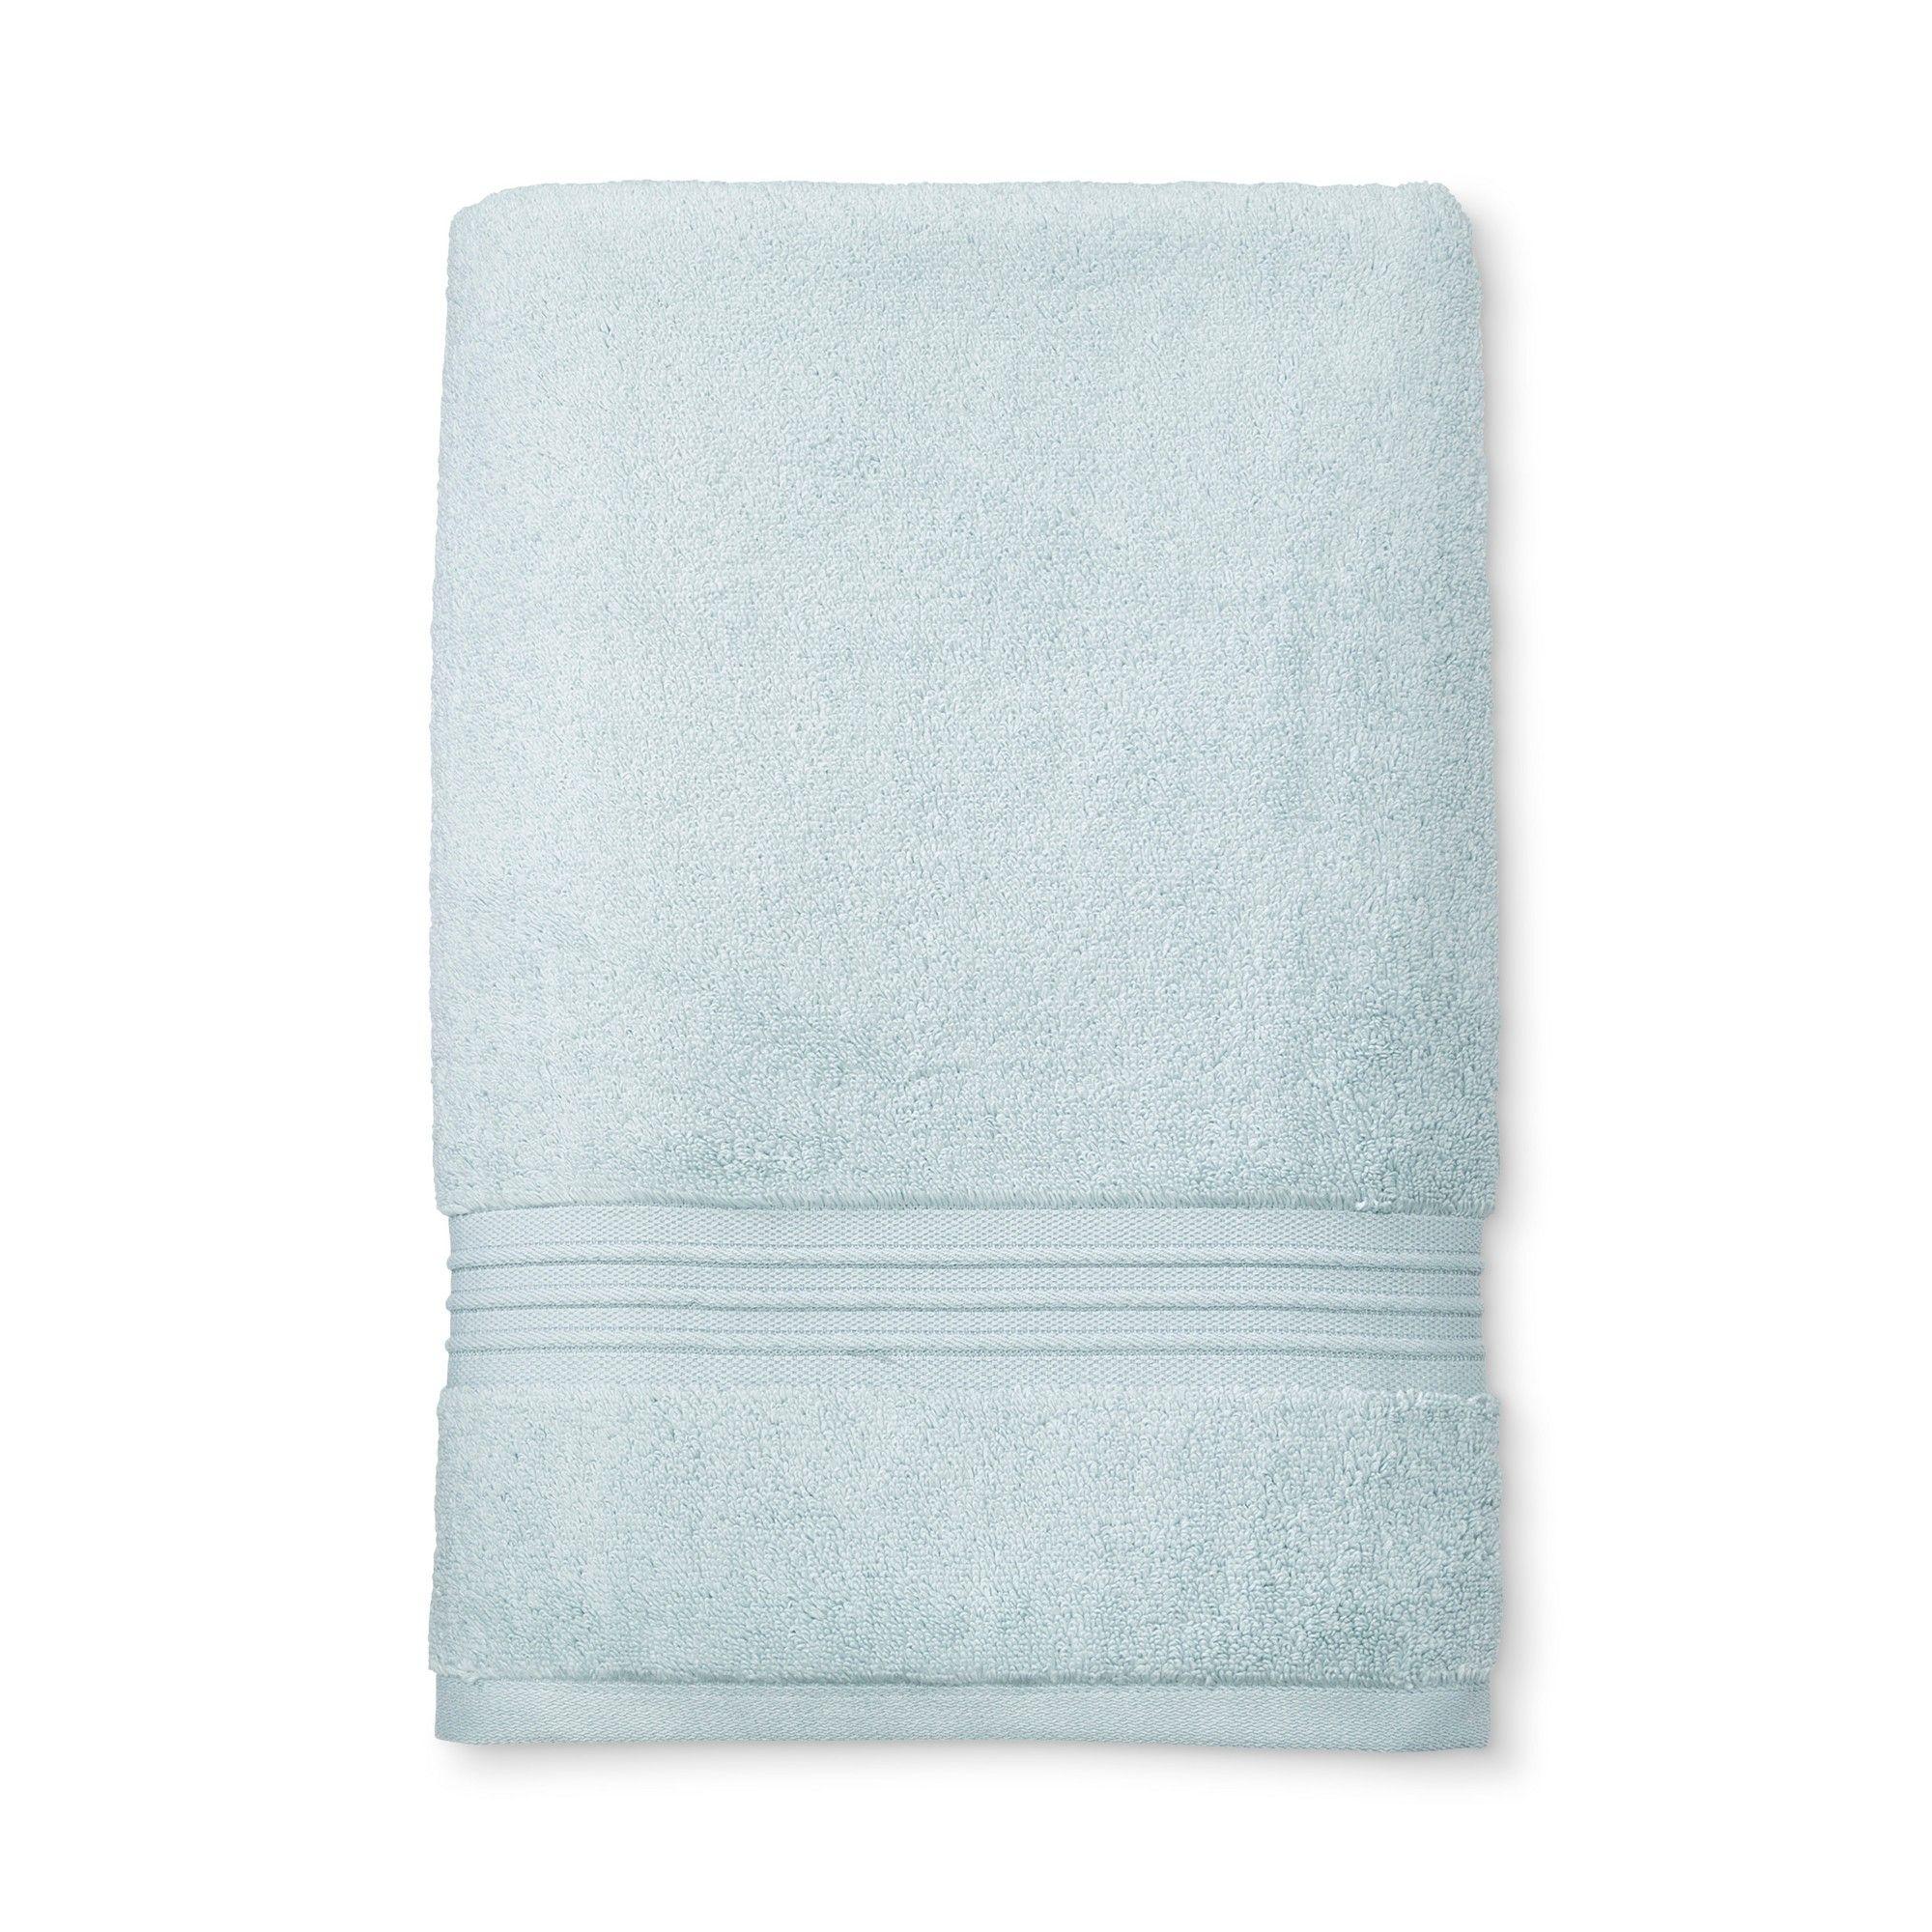 Spa Bath Sheet Light Blue Fieldcrest Bath Sheets Bath Towels Spa